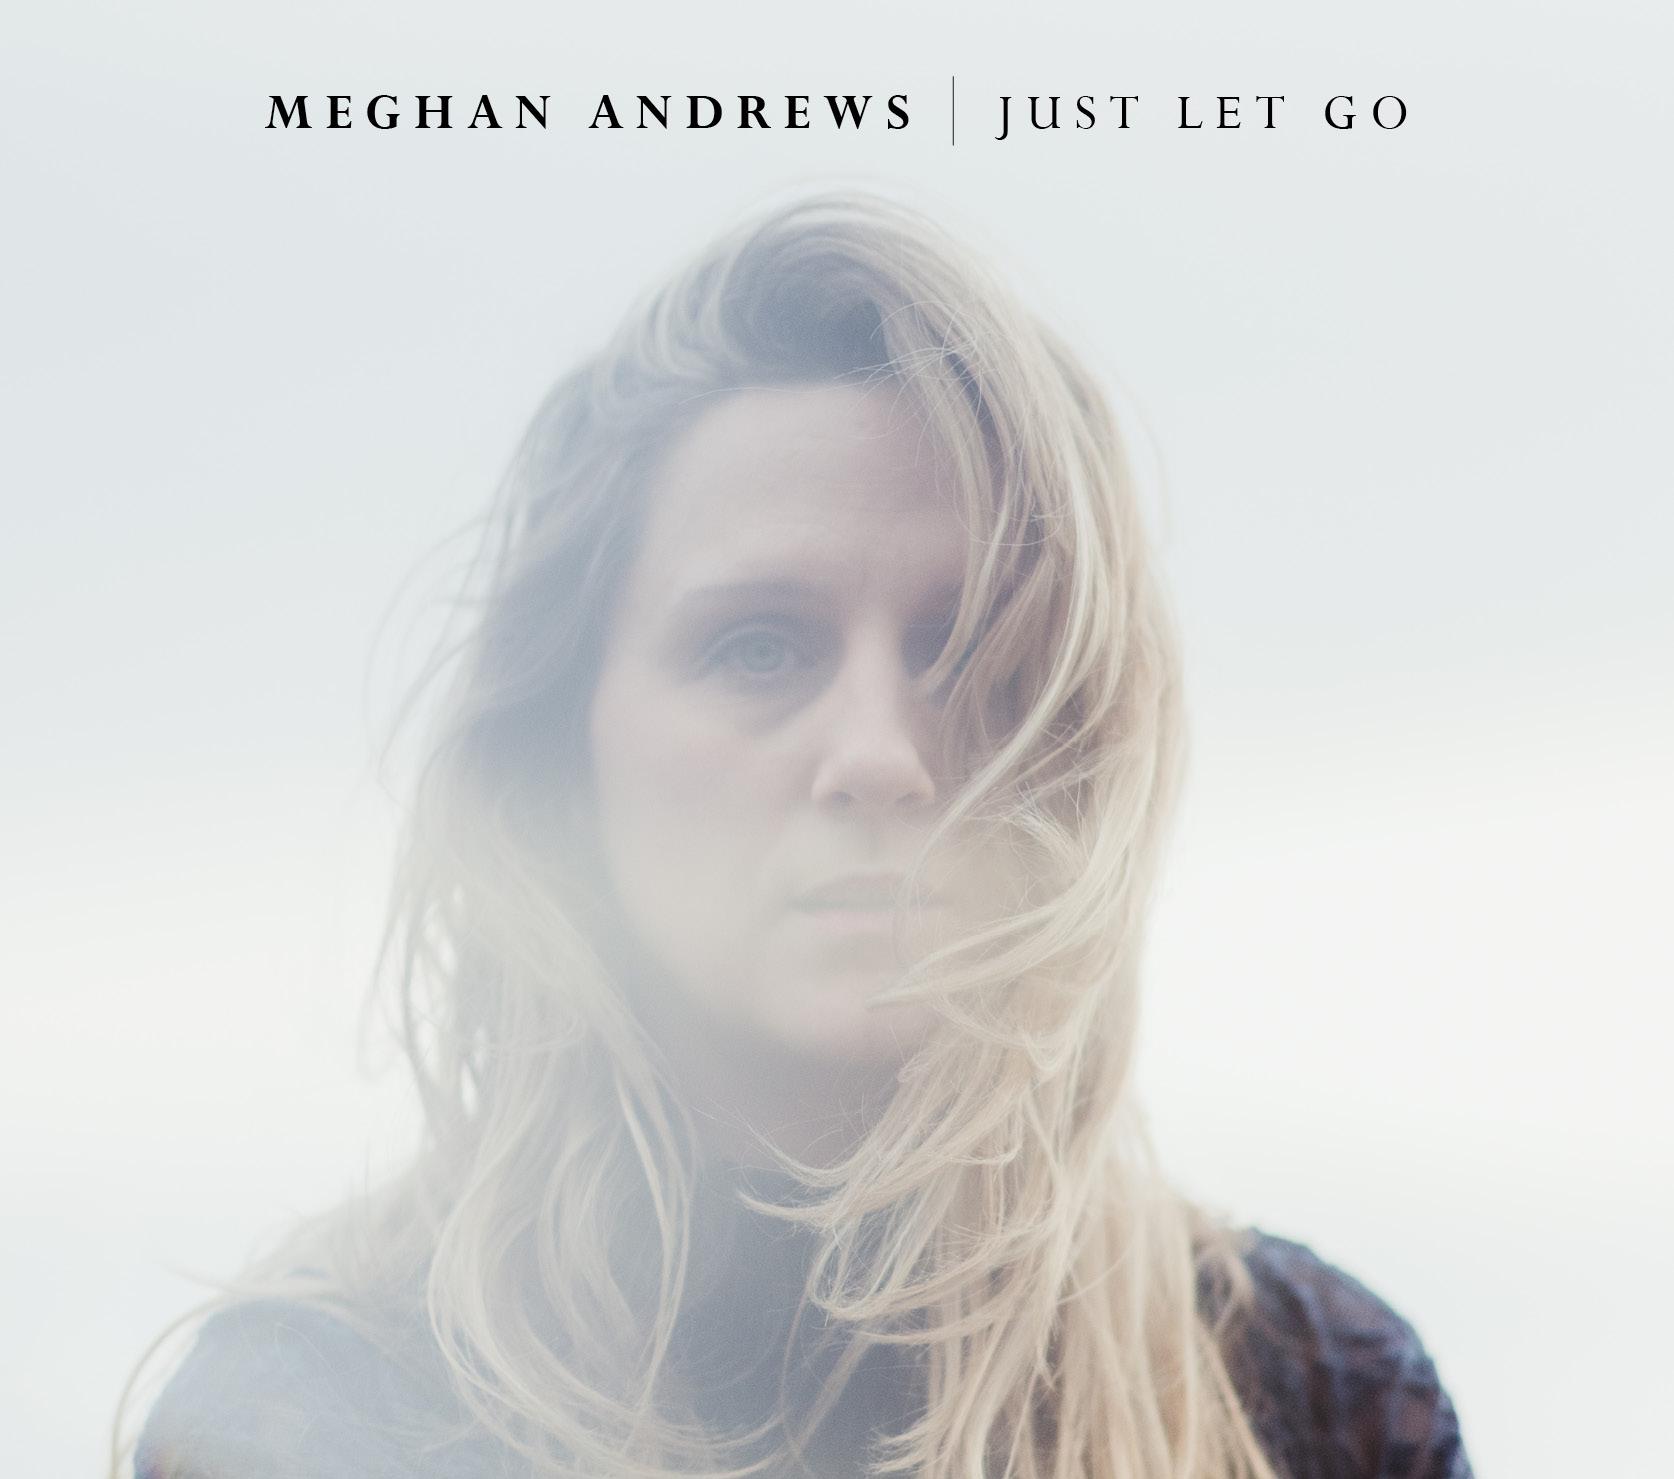 Meghan Andrews - Just Let Go - Cover Image